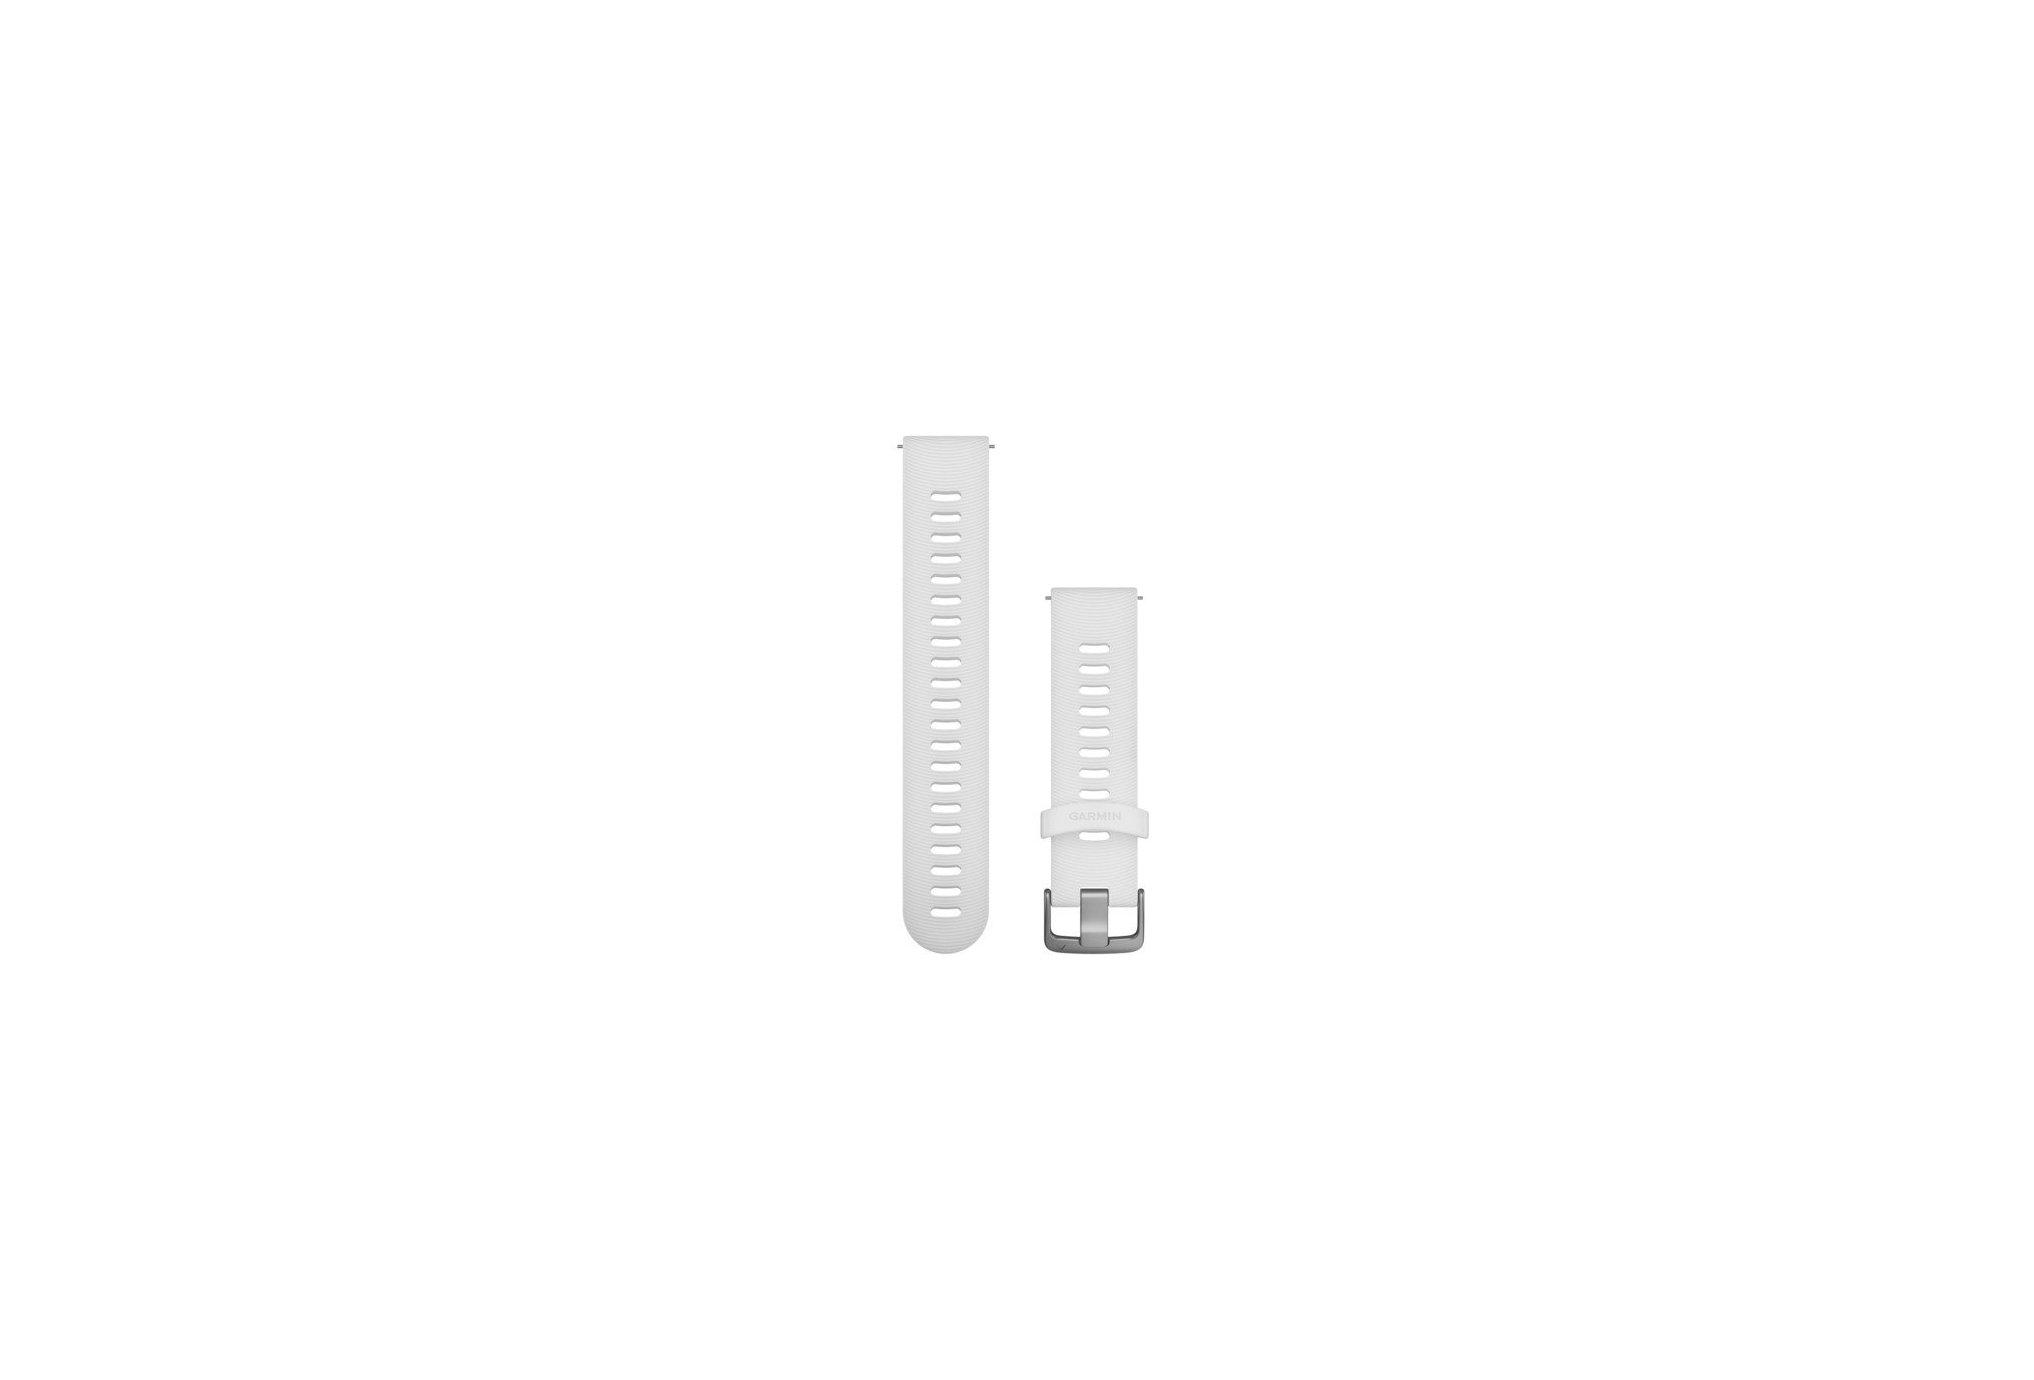 Garmin Bracelet de rechange Forerunner 245 - 20 mm Accessoires montres/ Bracelets